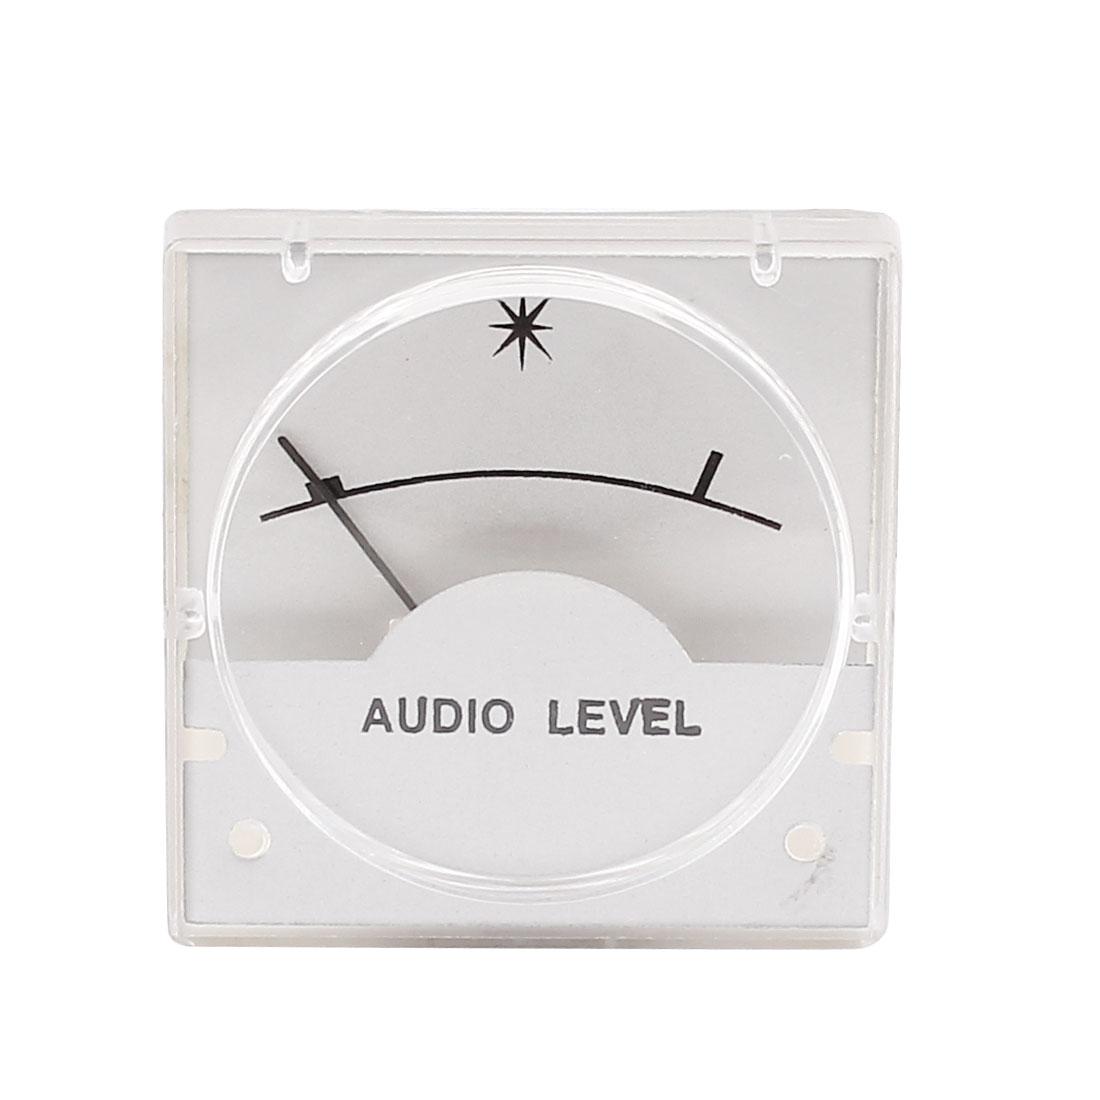 500uA 700 Ohm Amplifier Radio FM Panel Analog Audio Level Meter VU Header